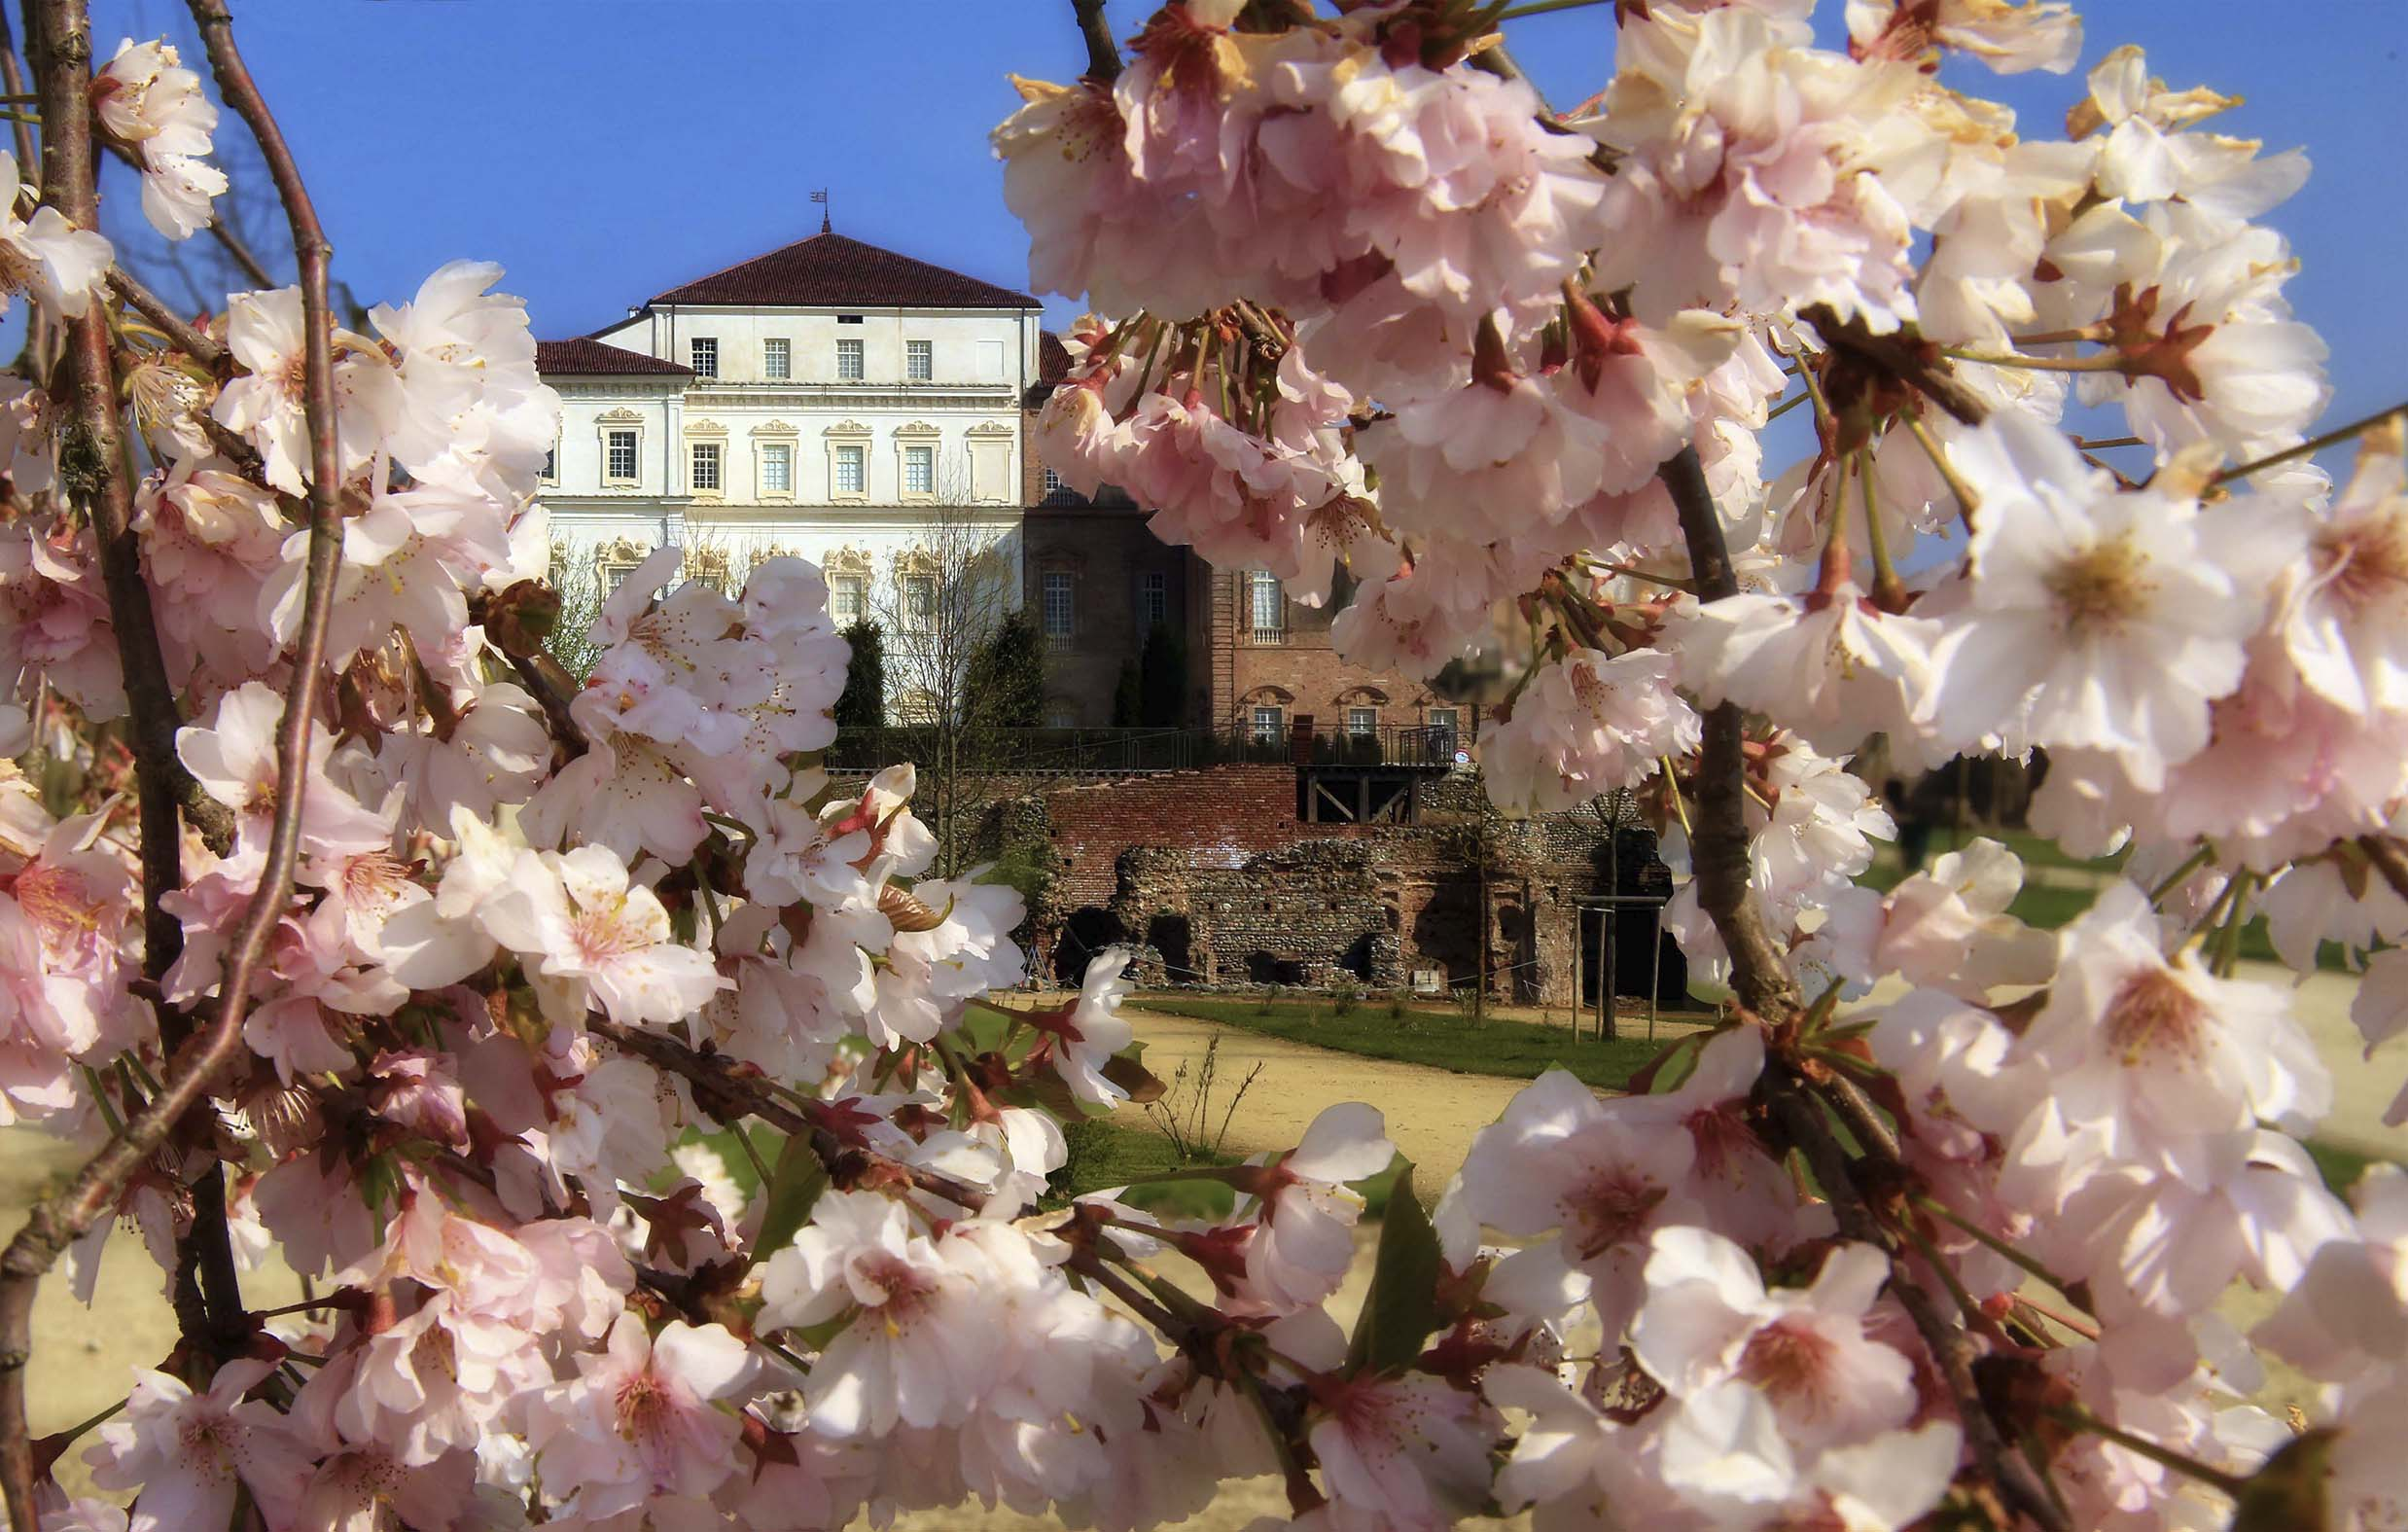 Archivio Consorzio Residenze Reali Sabaude